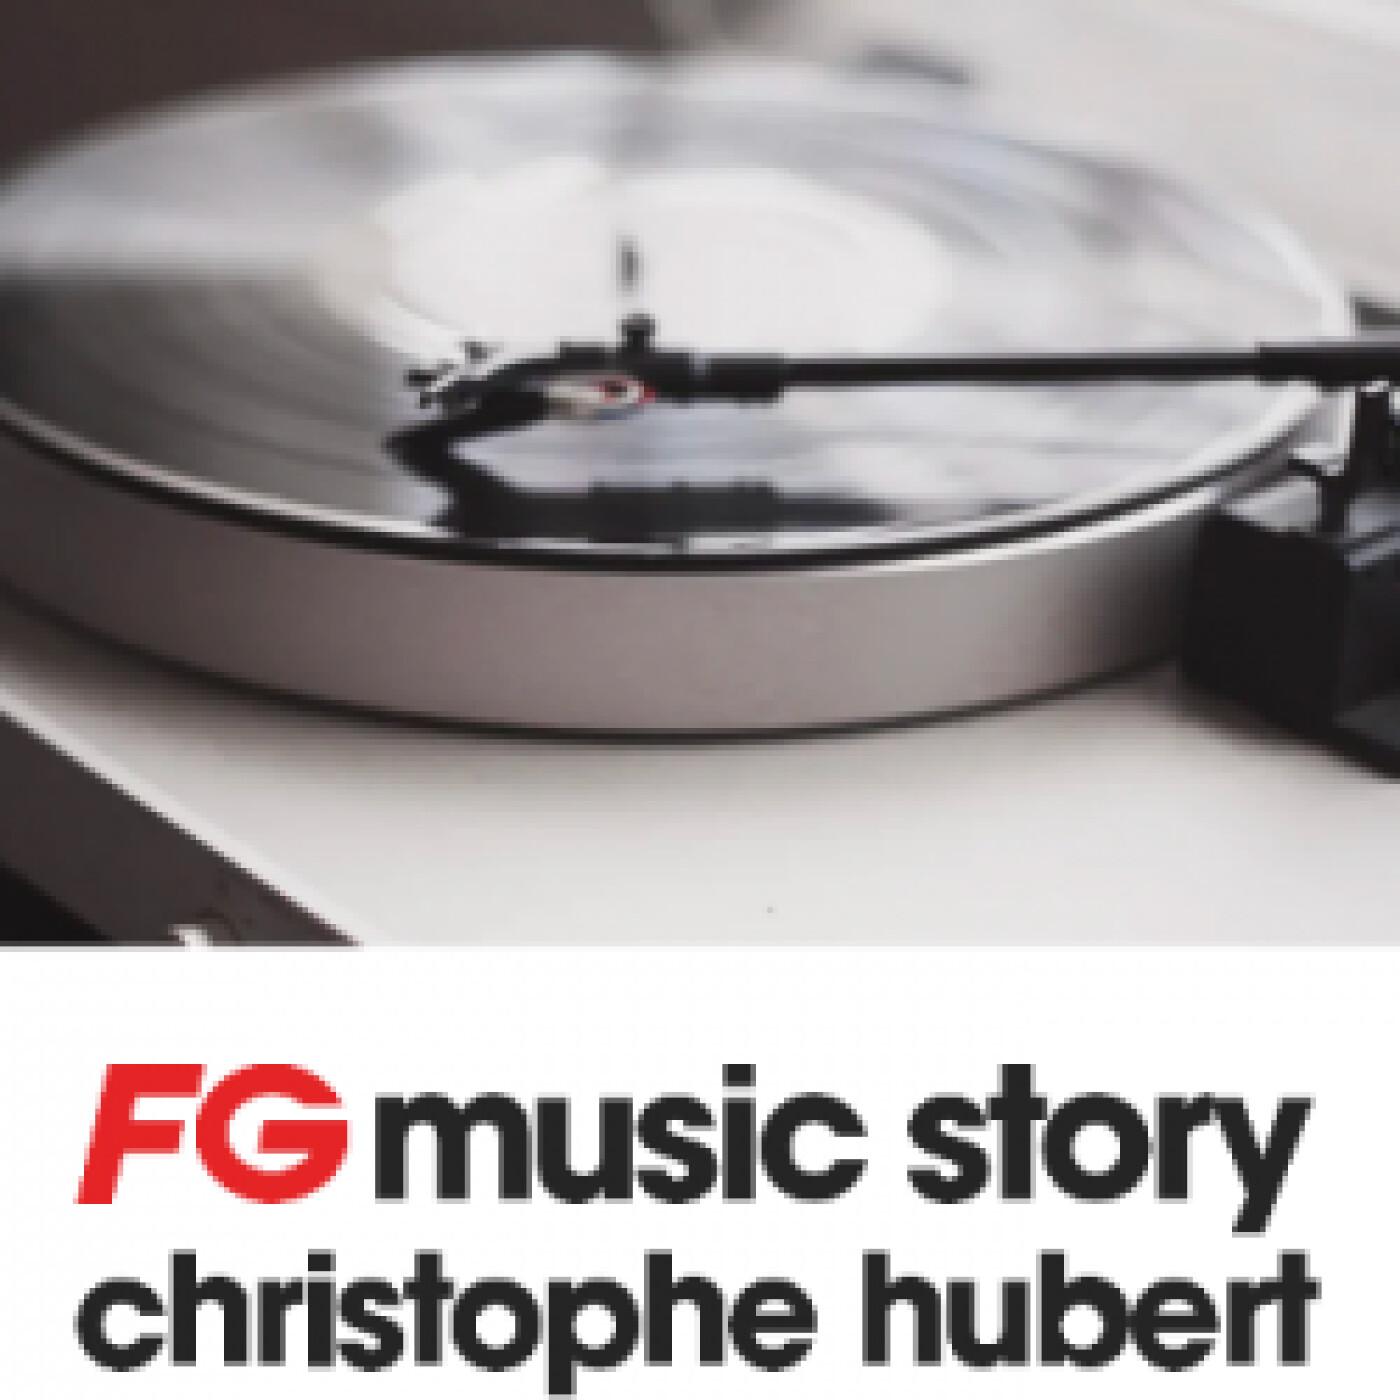 FG MUSIC STORY : MARK KNIGHT